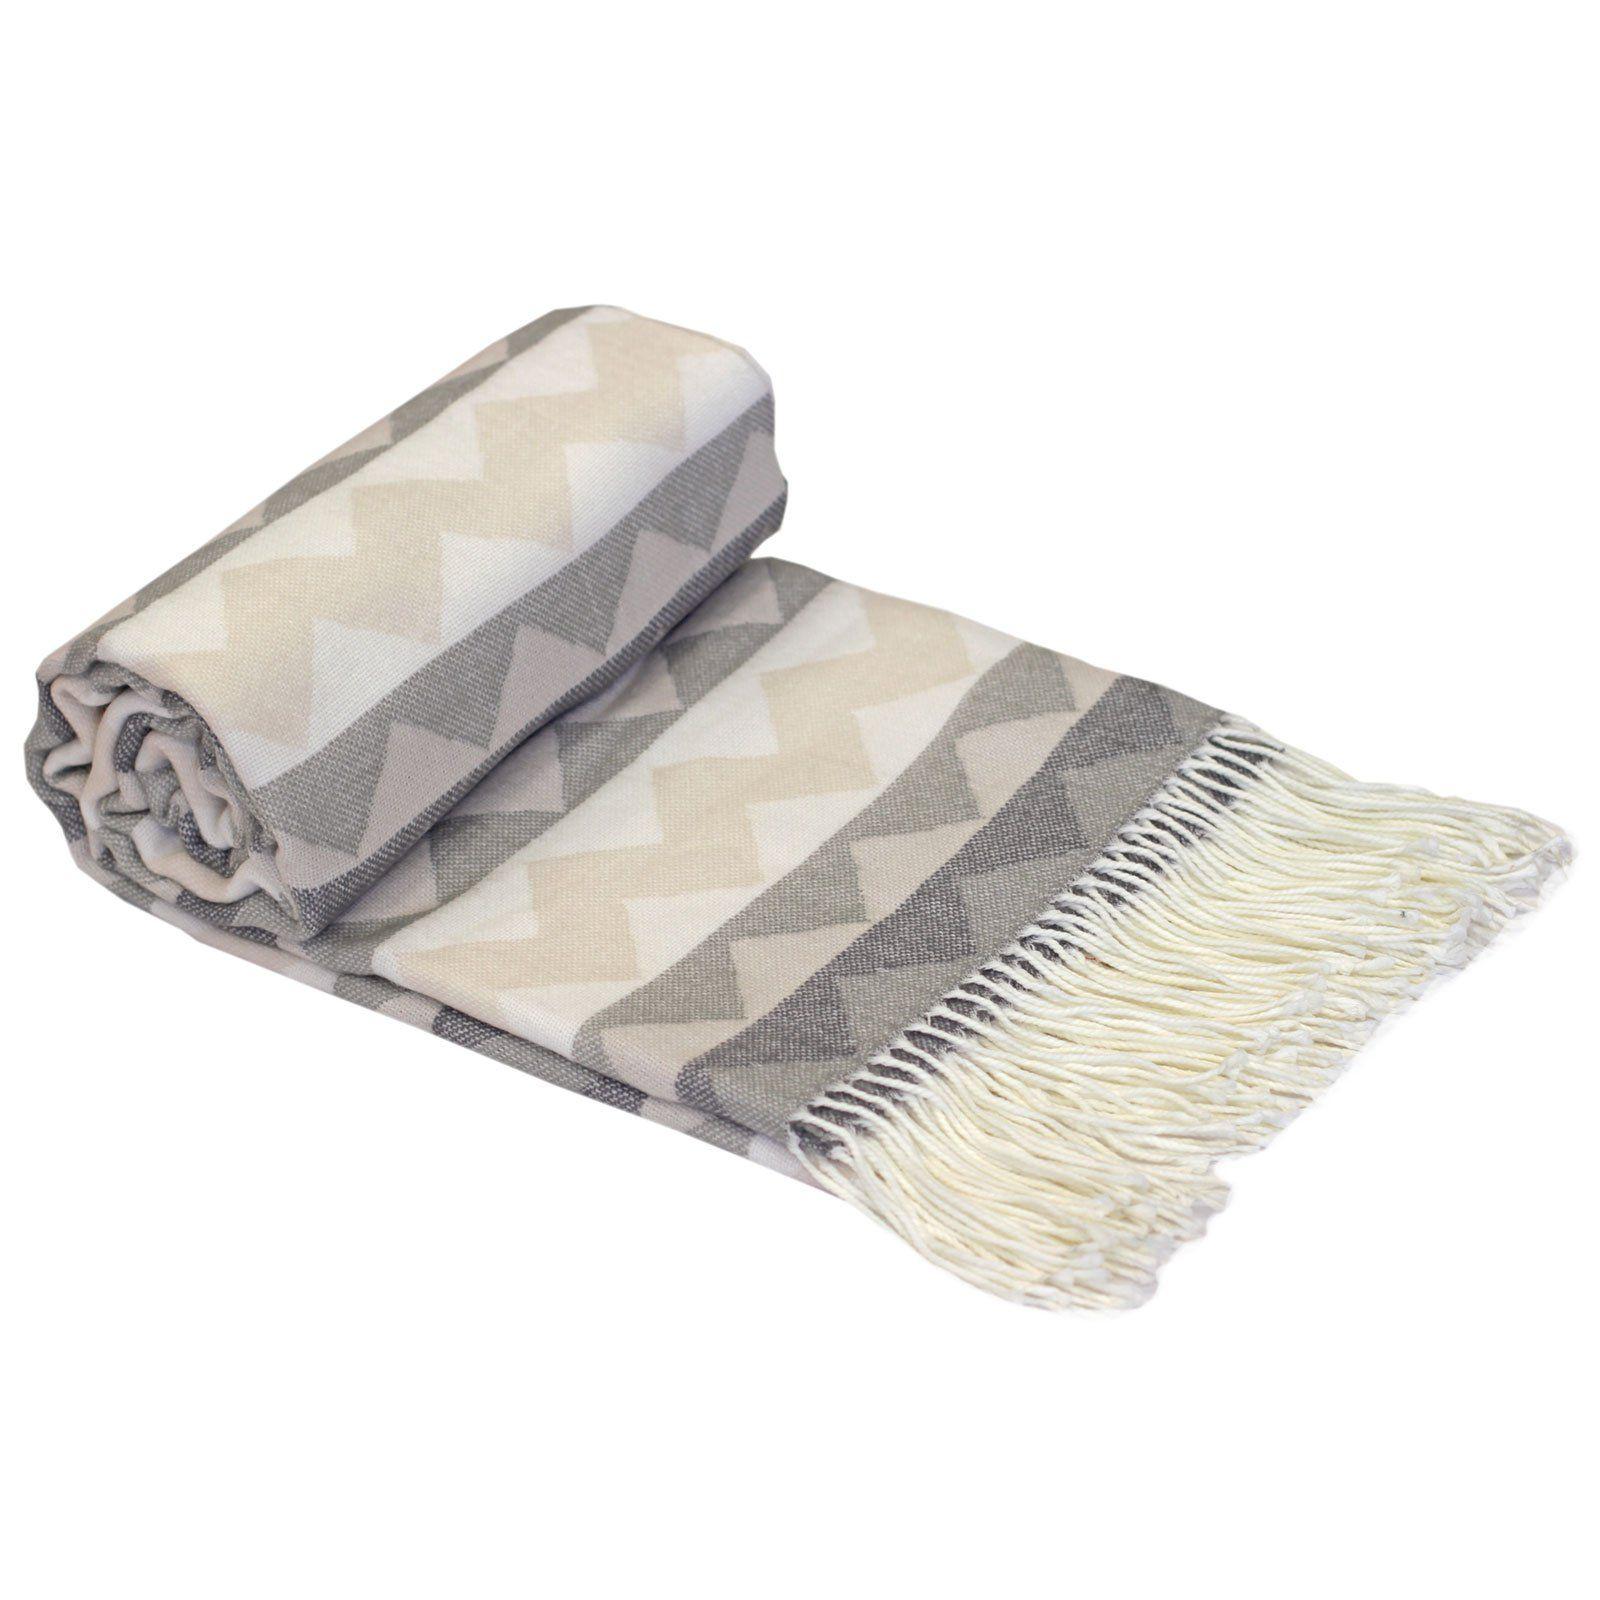 cream sofa throws uk muuto pink just contempo single aztec tribal woven fringe throw over